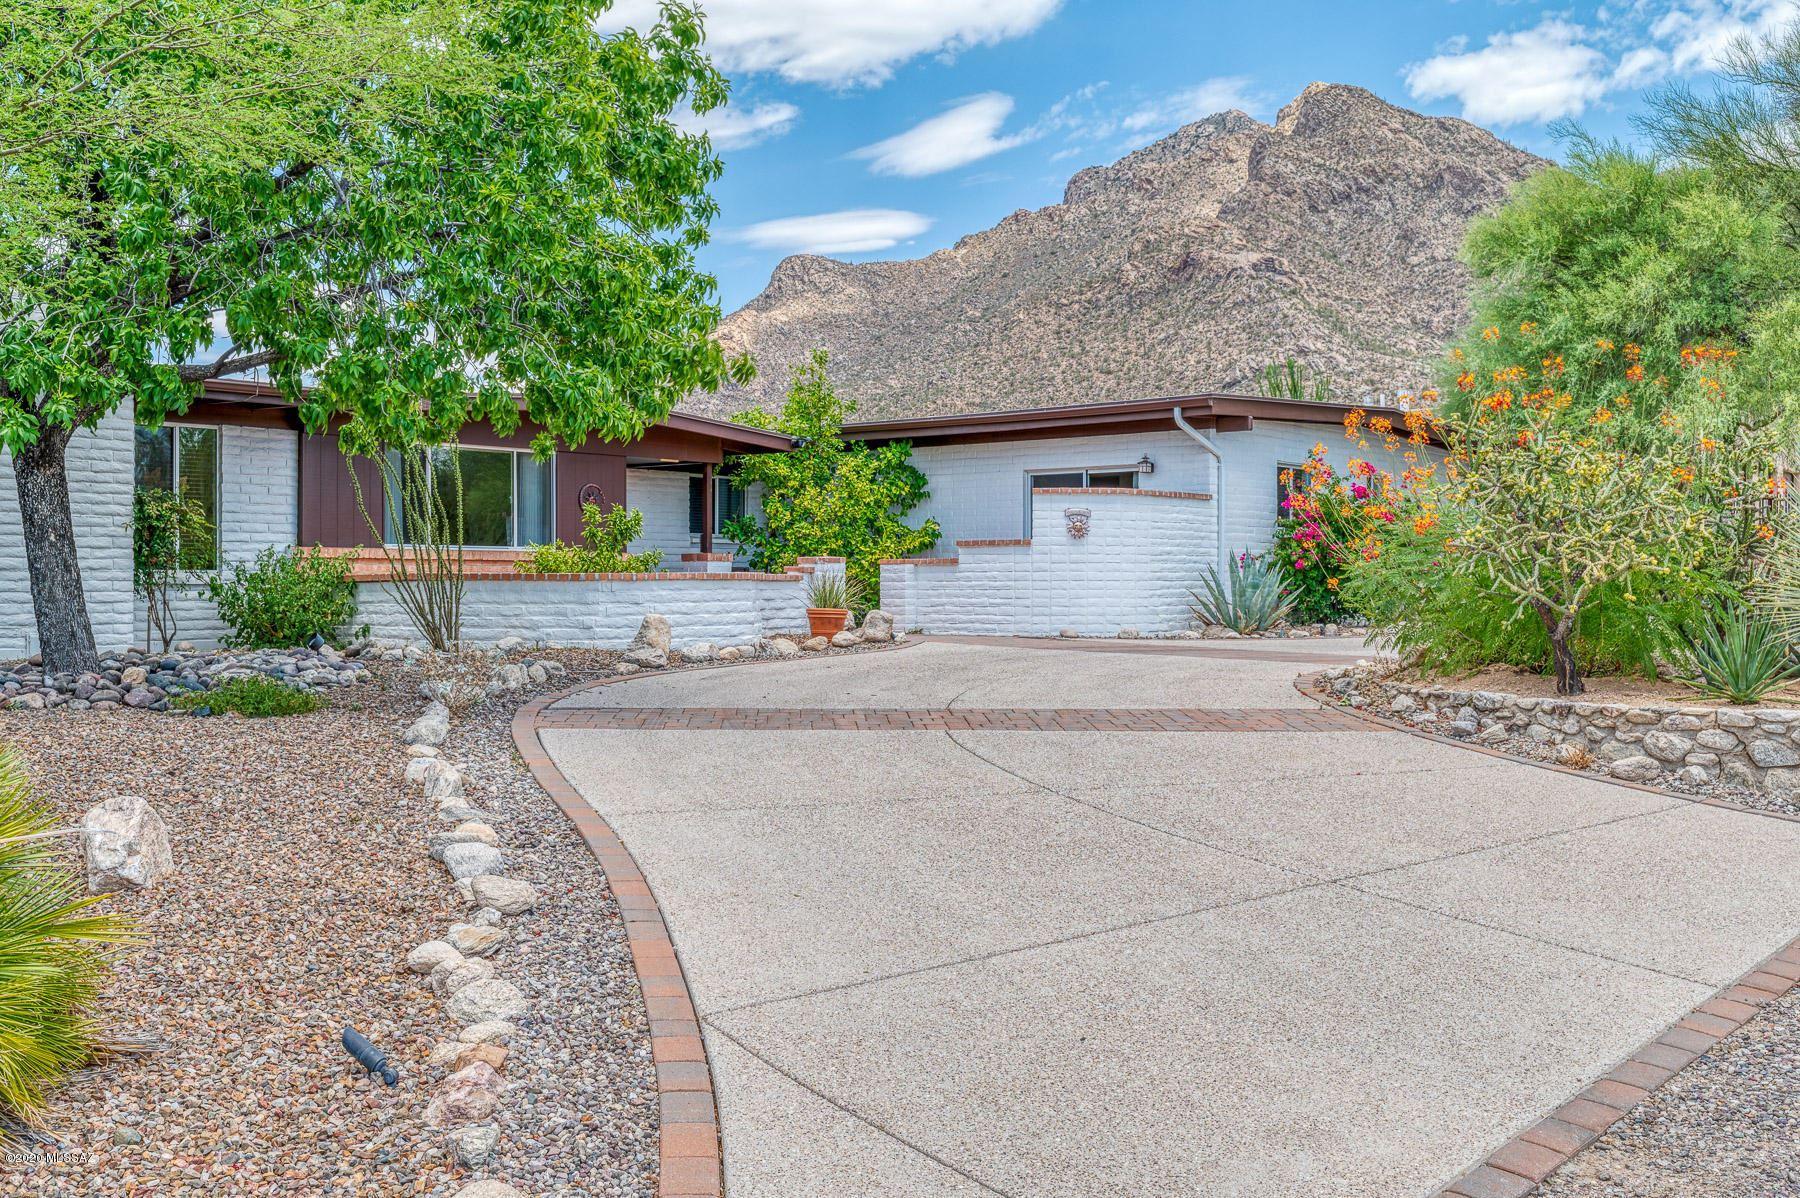 401 E Catalina Shadows Boulevard, Tucson, AZ 85704 - MLS#: 22018471